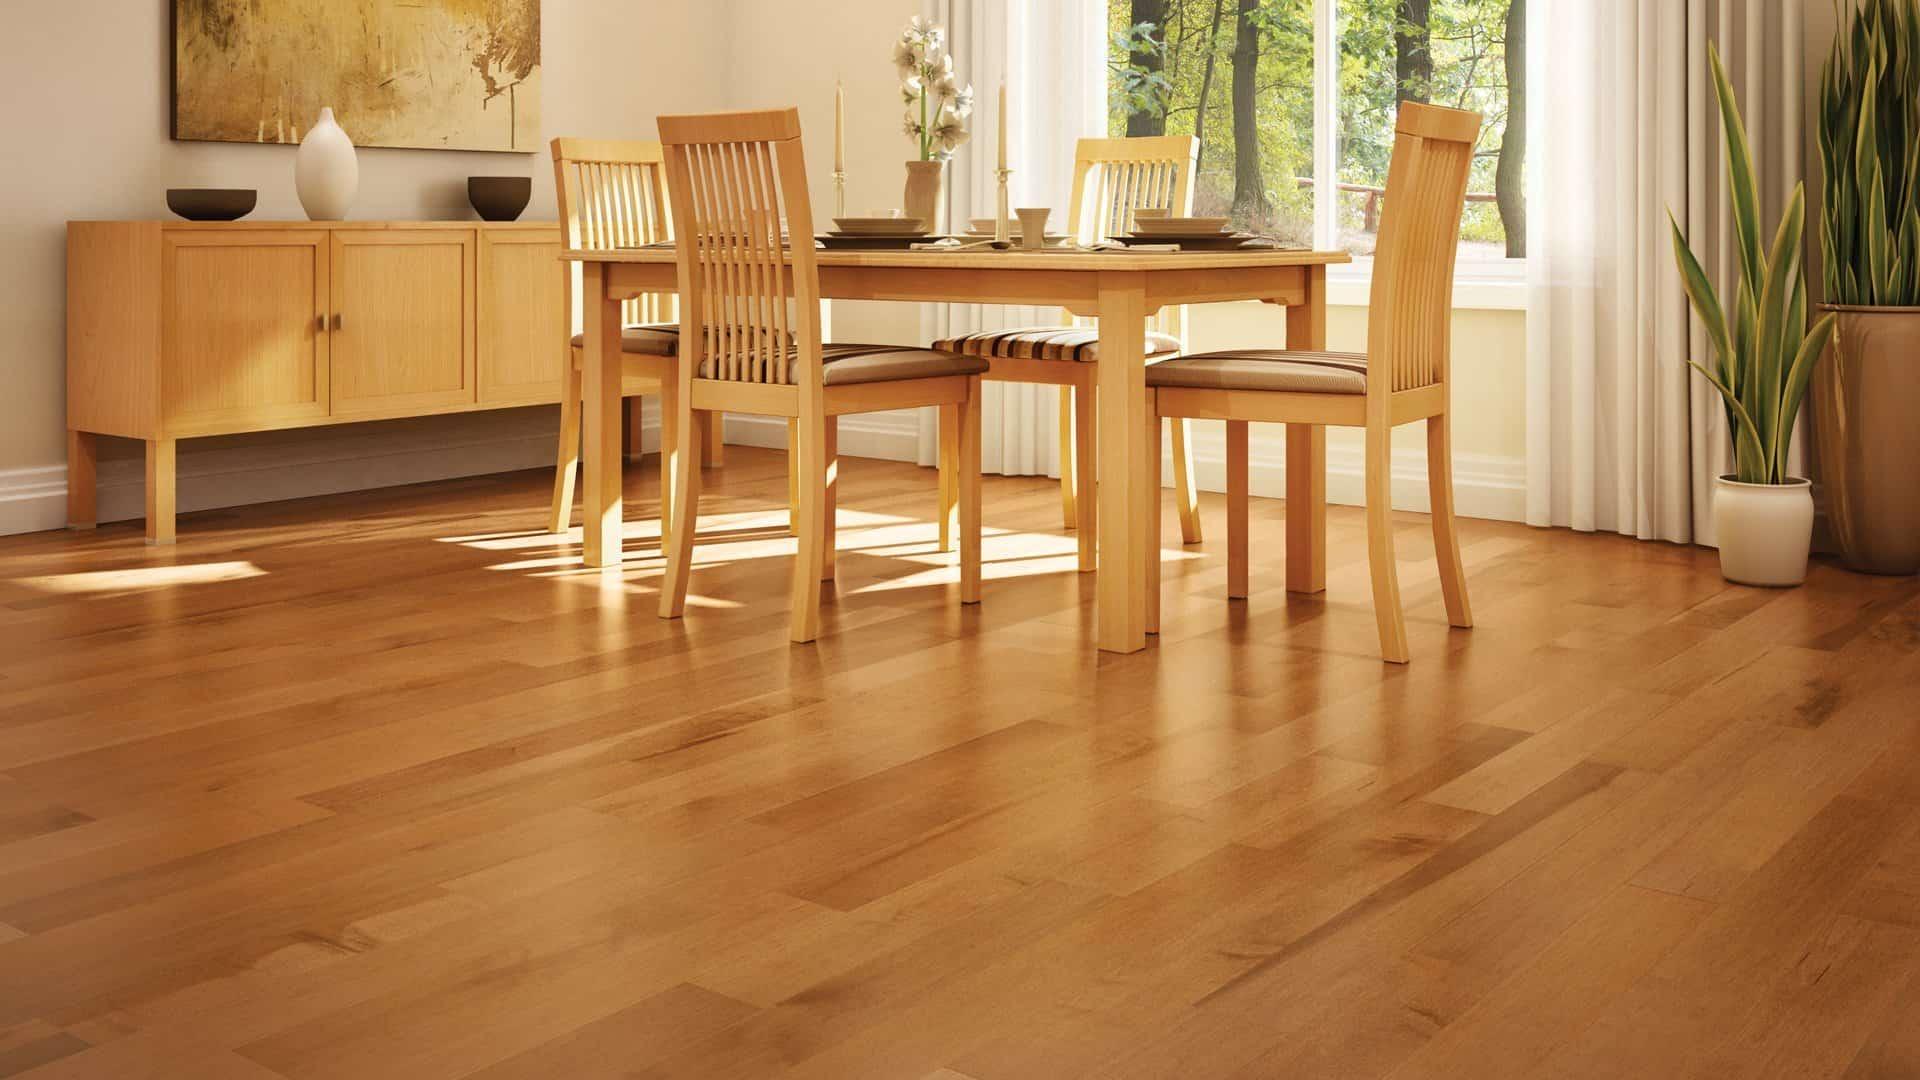 GALLERY DUBEAU FLOORS - How hard is it to lay laminate flooring